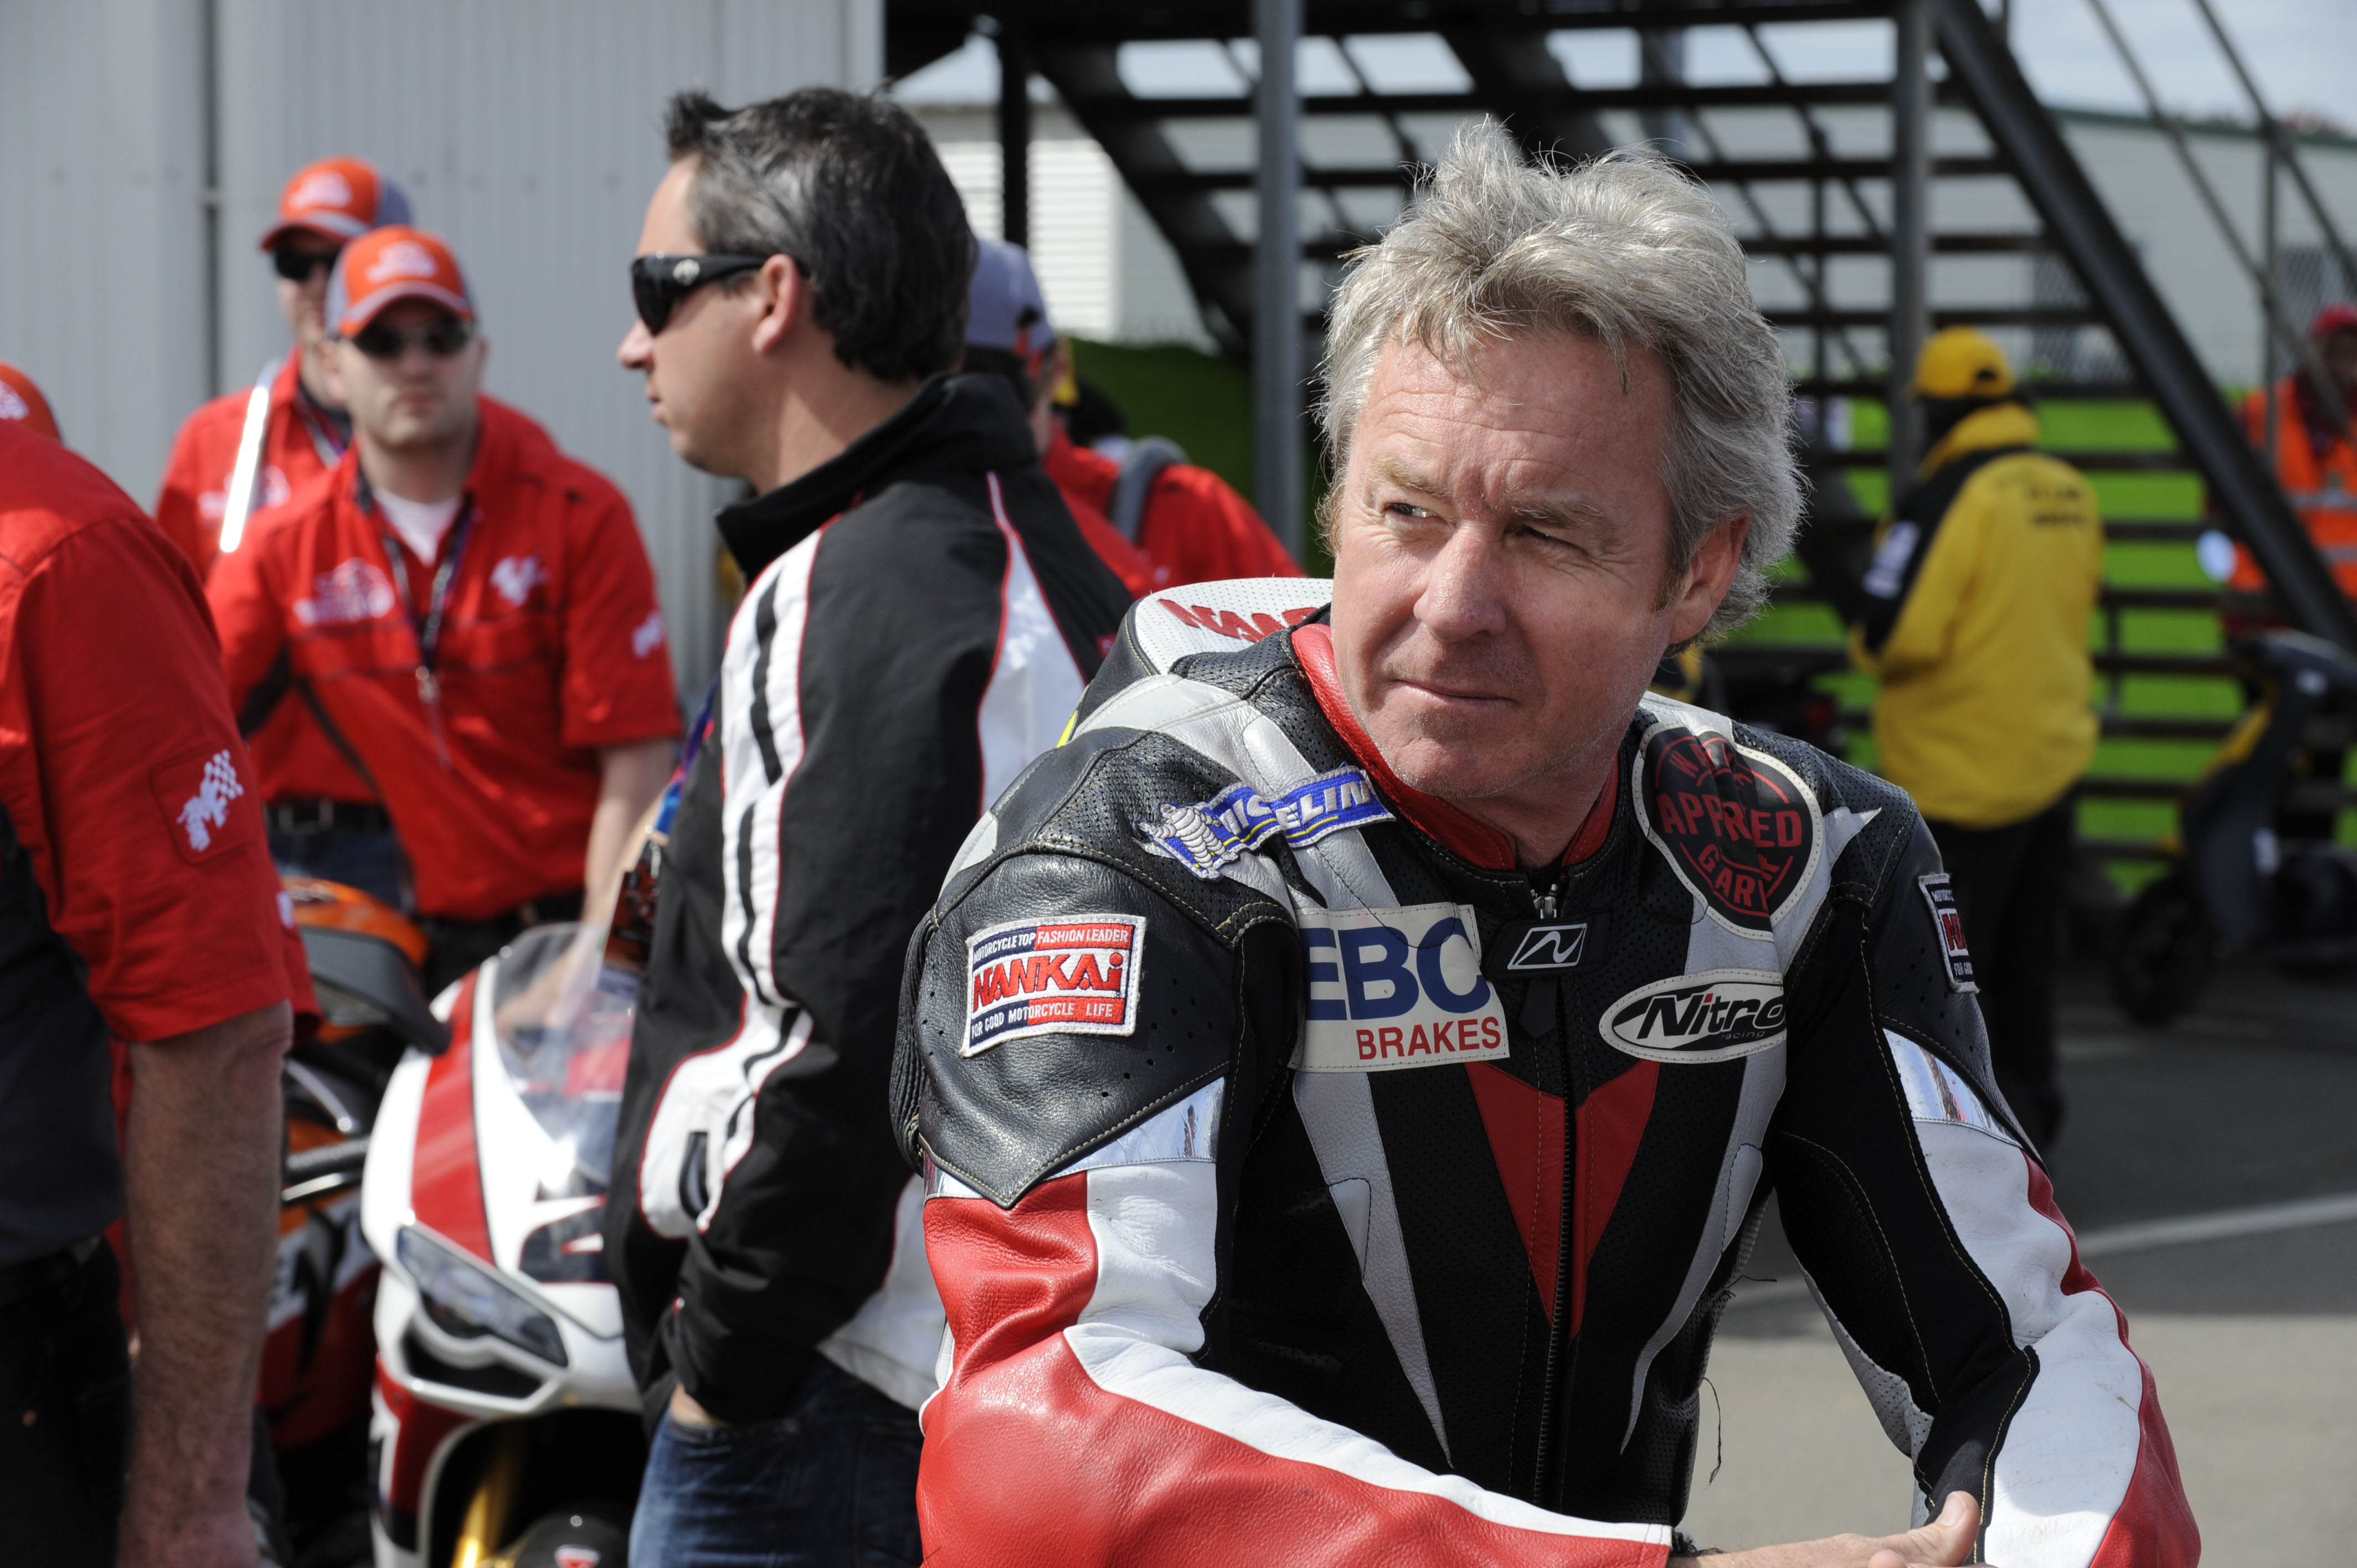 Gardner, Australian MotoGP 2009